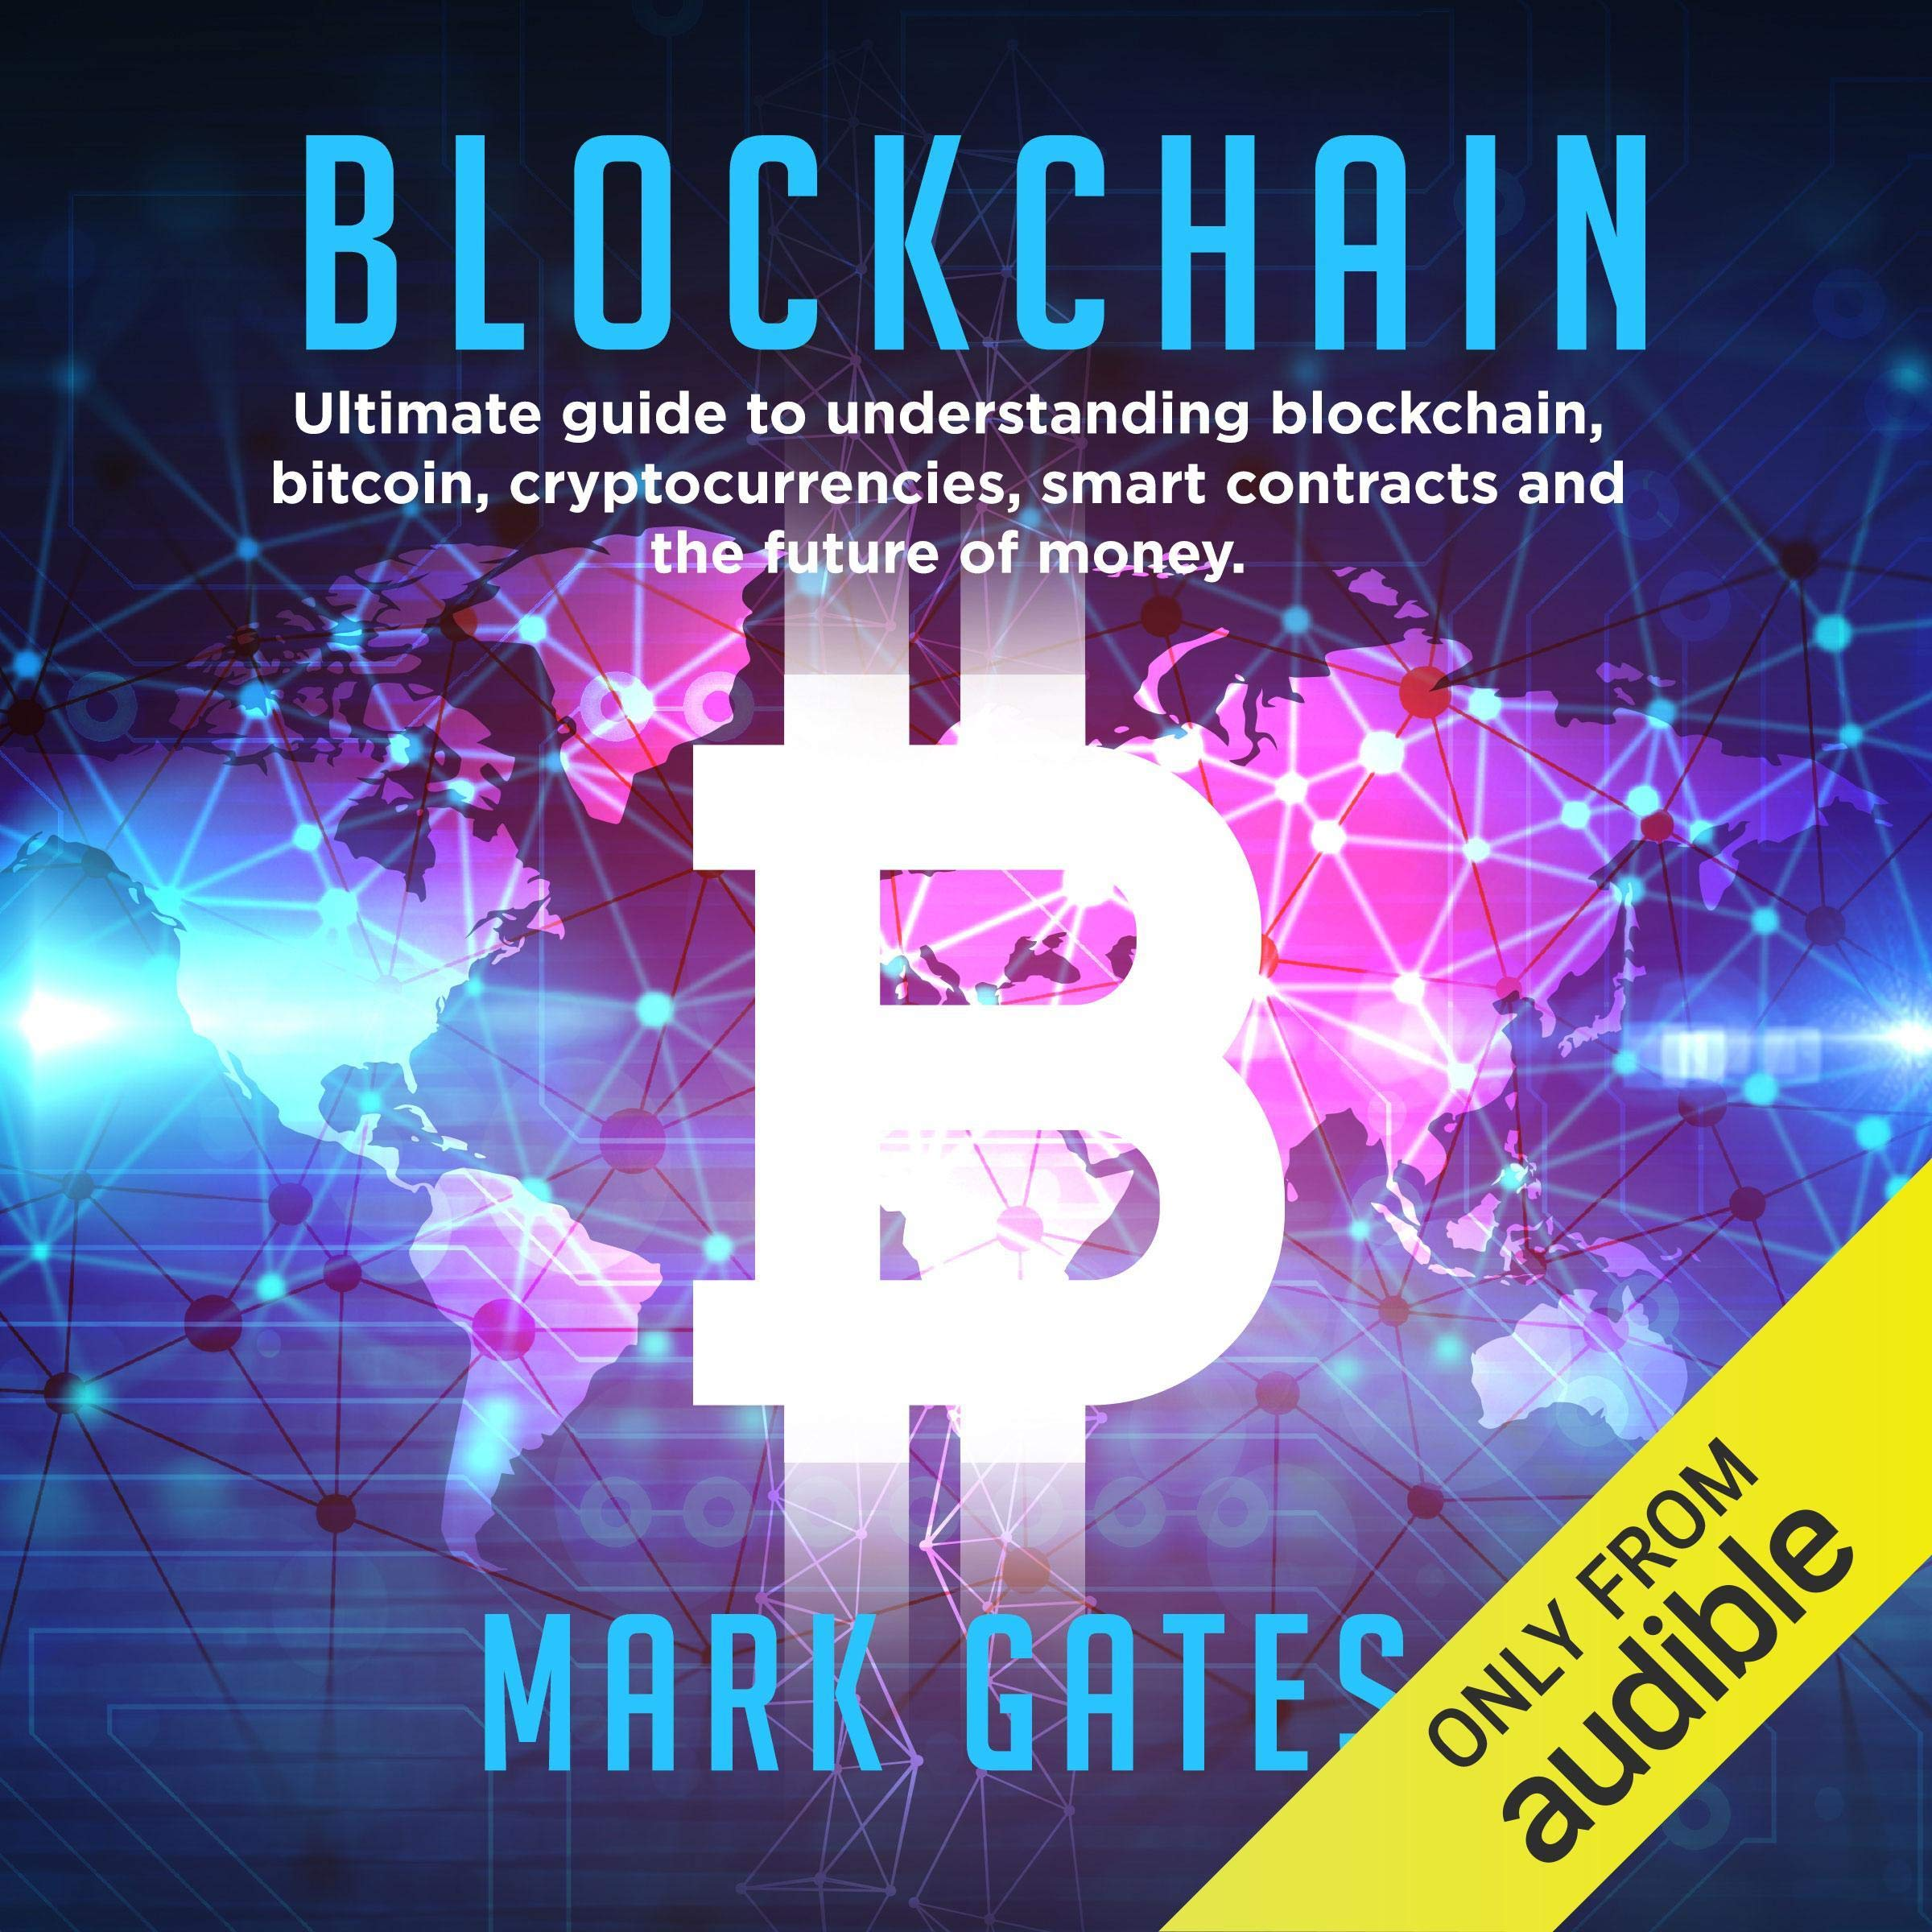 Blockchain: Ultimate guide to understanding